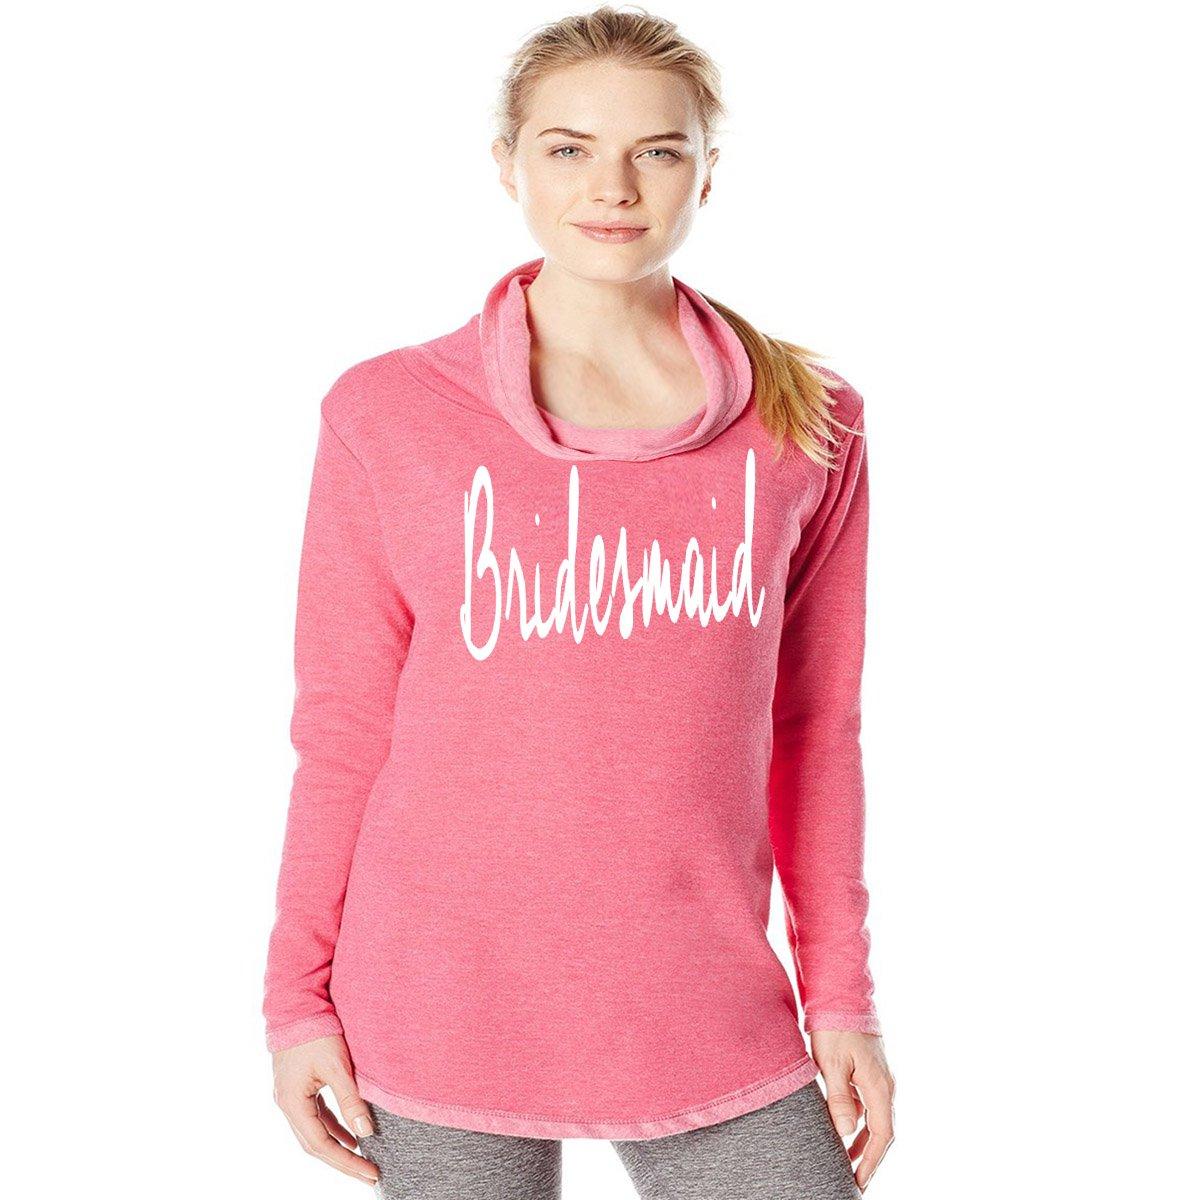 Super Soft Cotton Shirt Blend Womens Queen Apparel Bridesmaid Sweatshirt